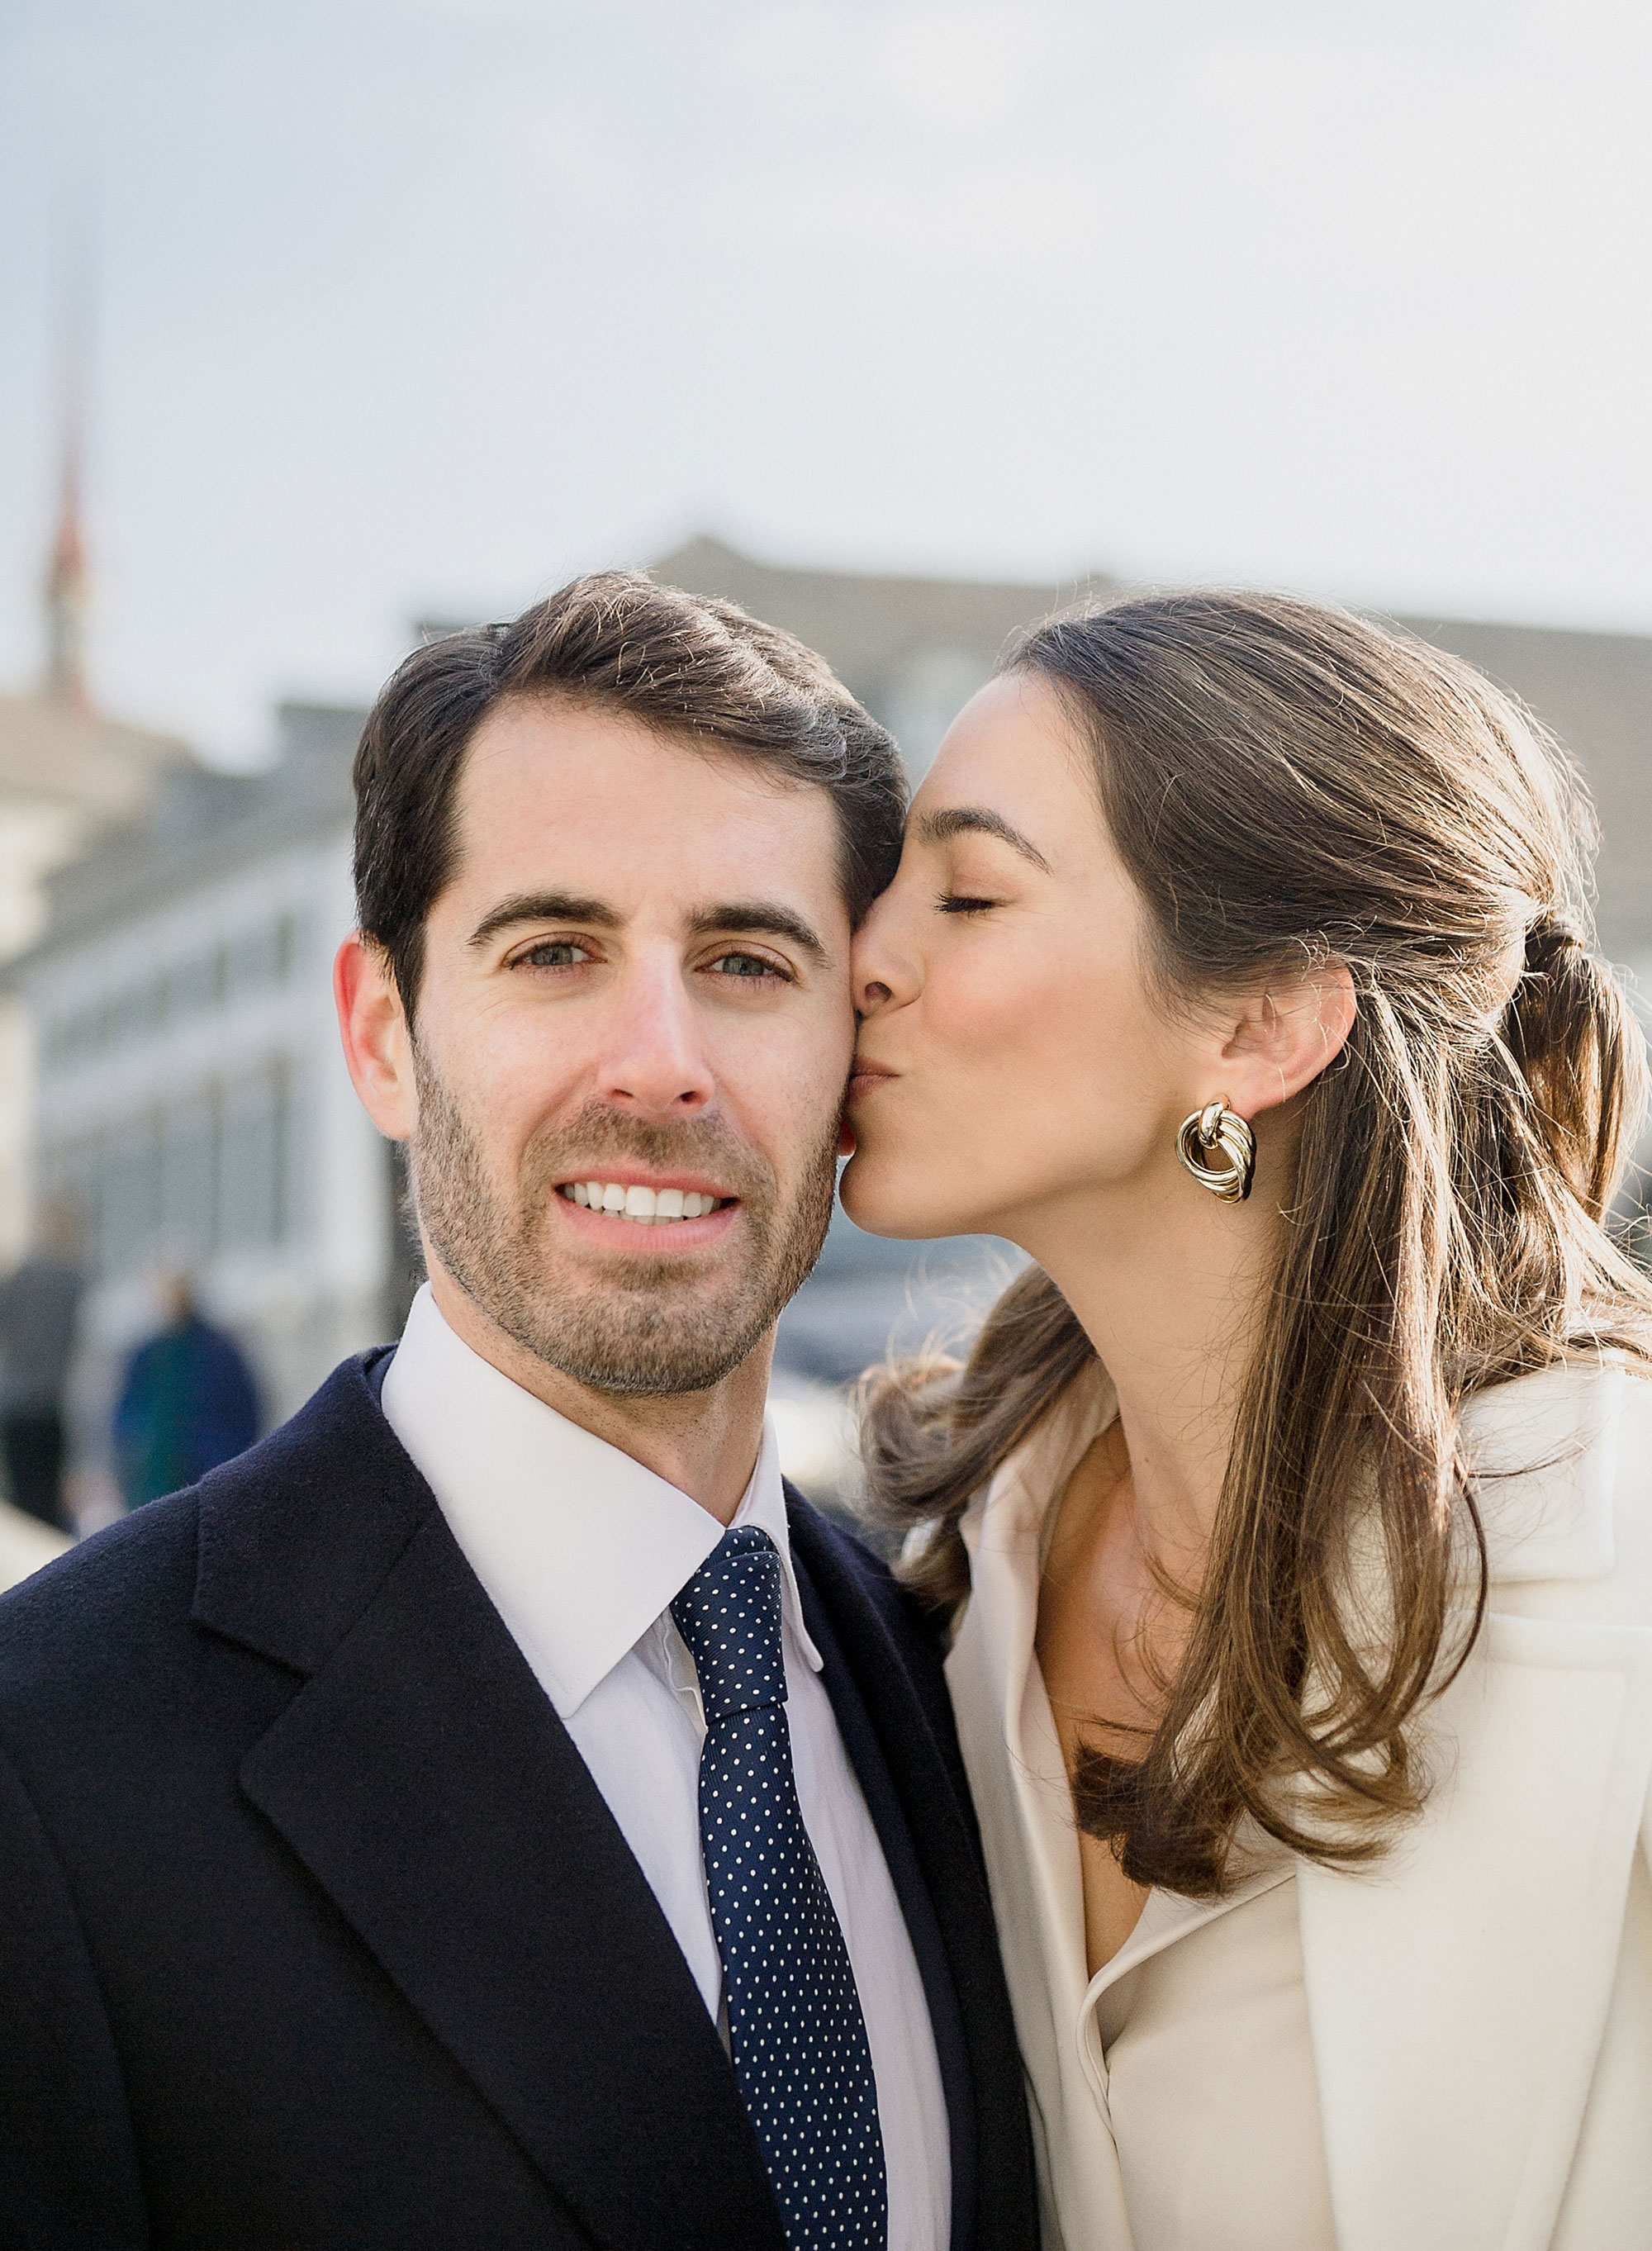 juliana-cosimo-stadthaus-wedding-2.jpg